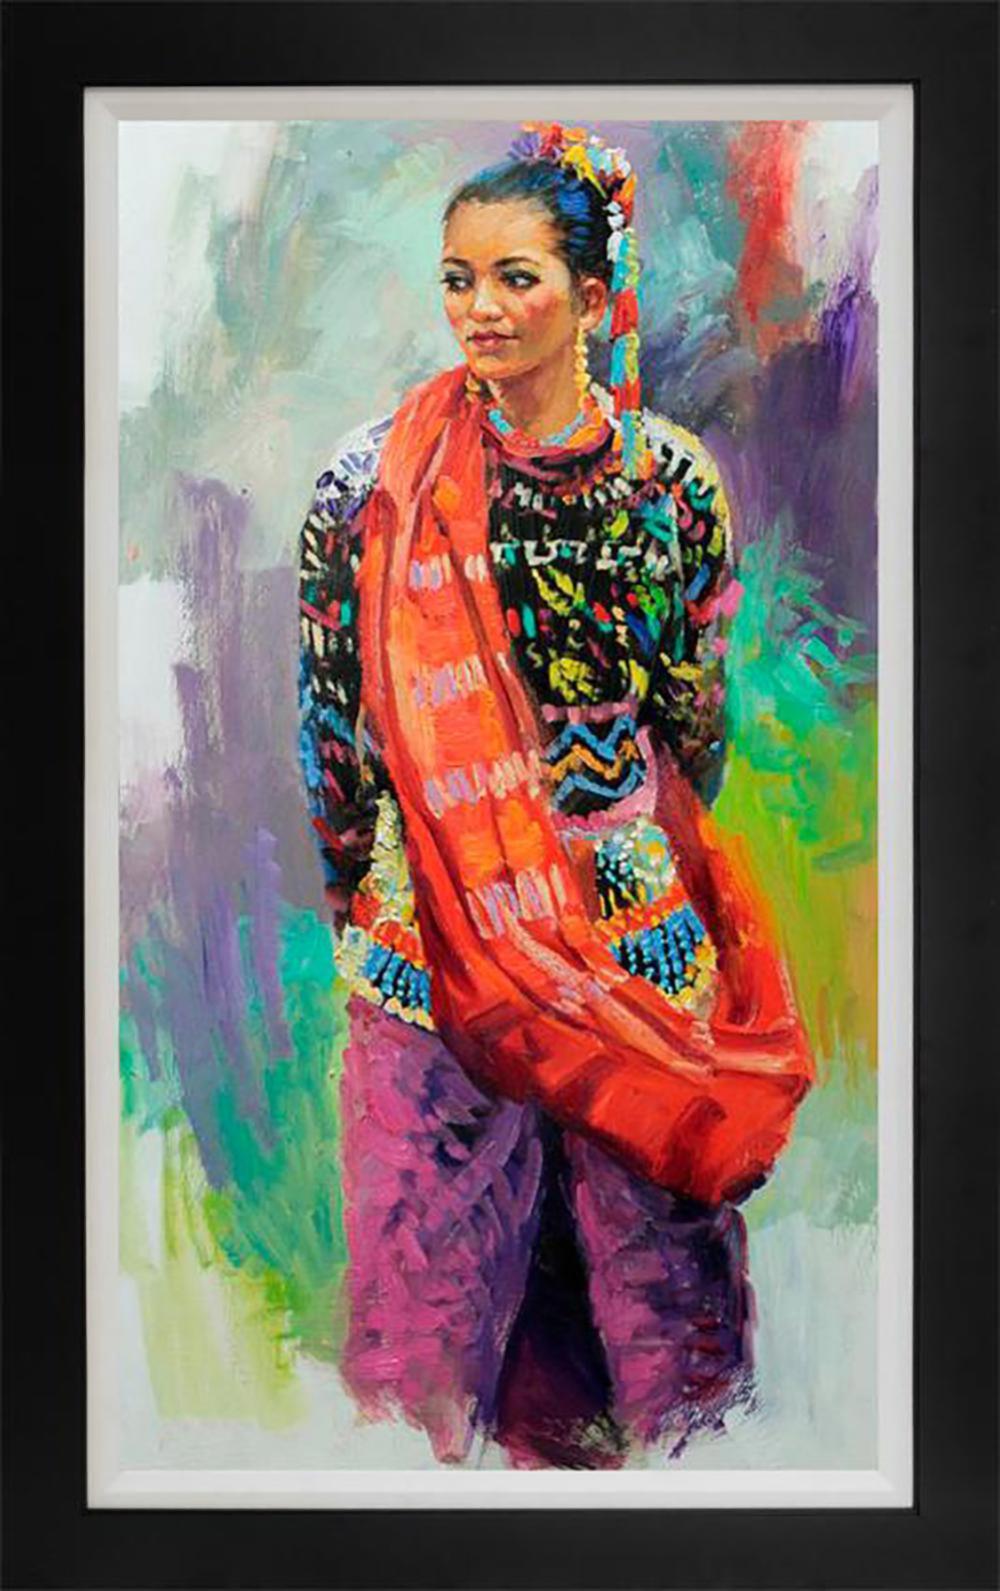 Rafael Maniago original mixed media on canvas